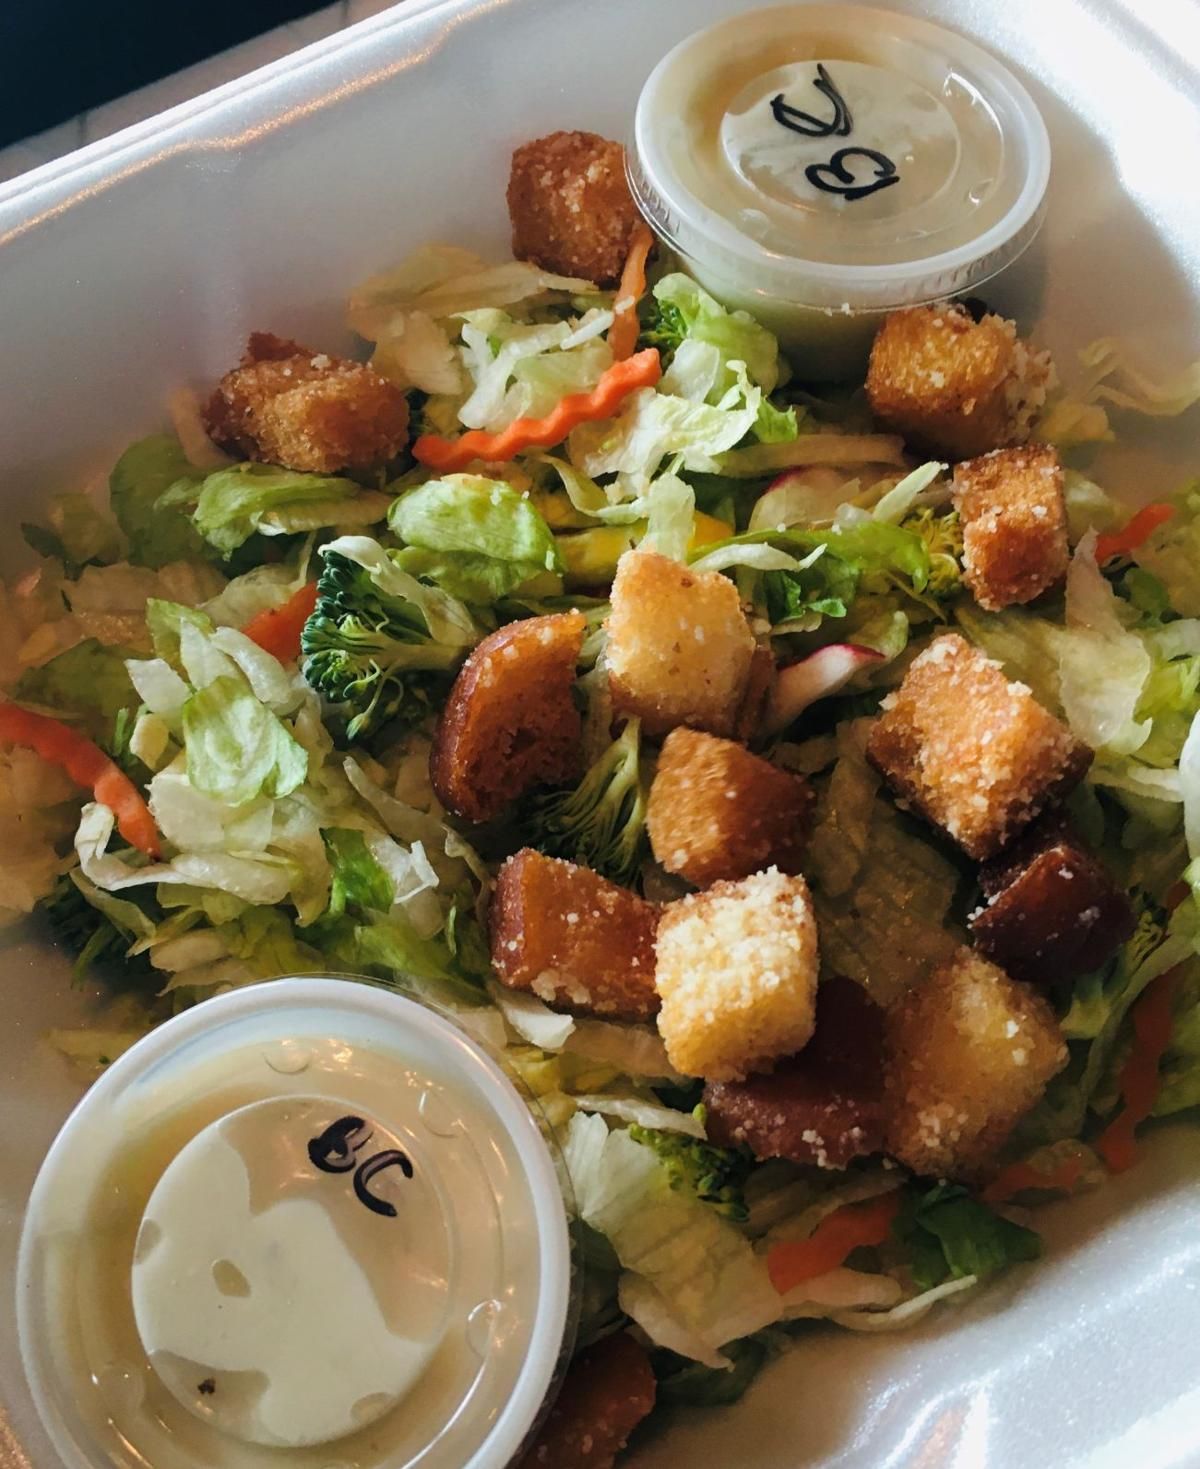 20200902-gm-food-guy-Garden Salad from Dannys.jpg